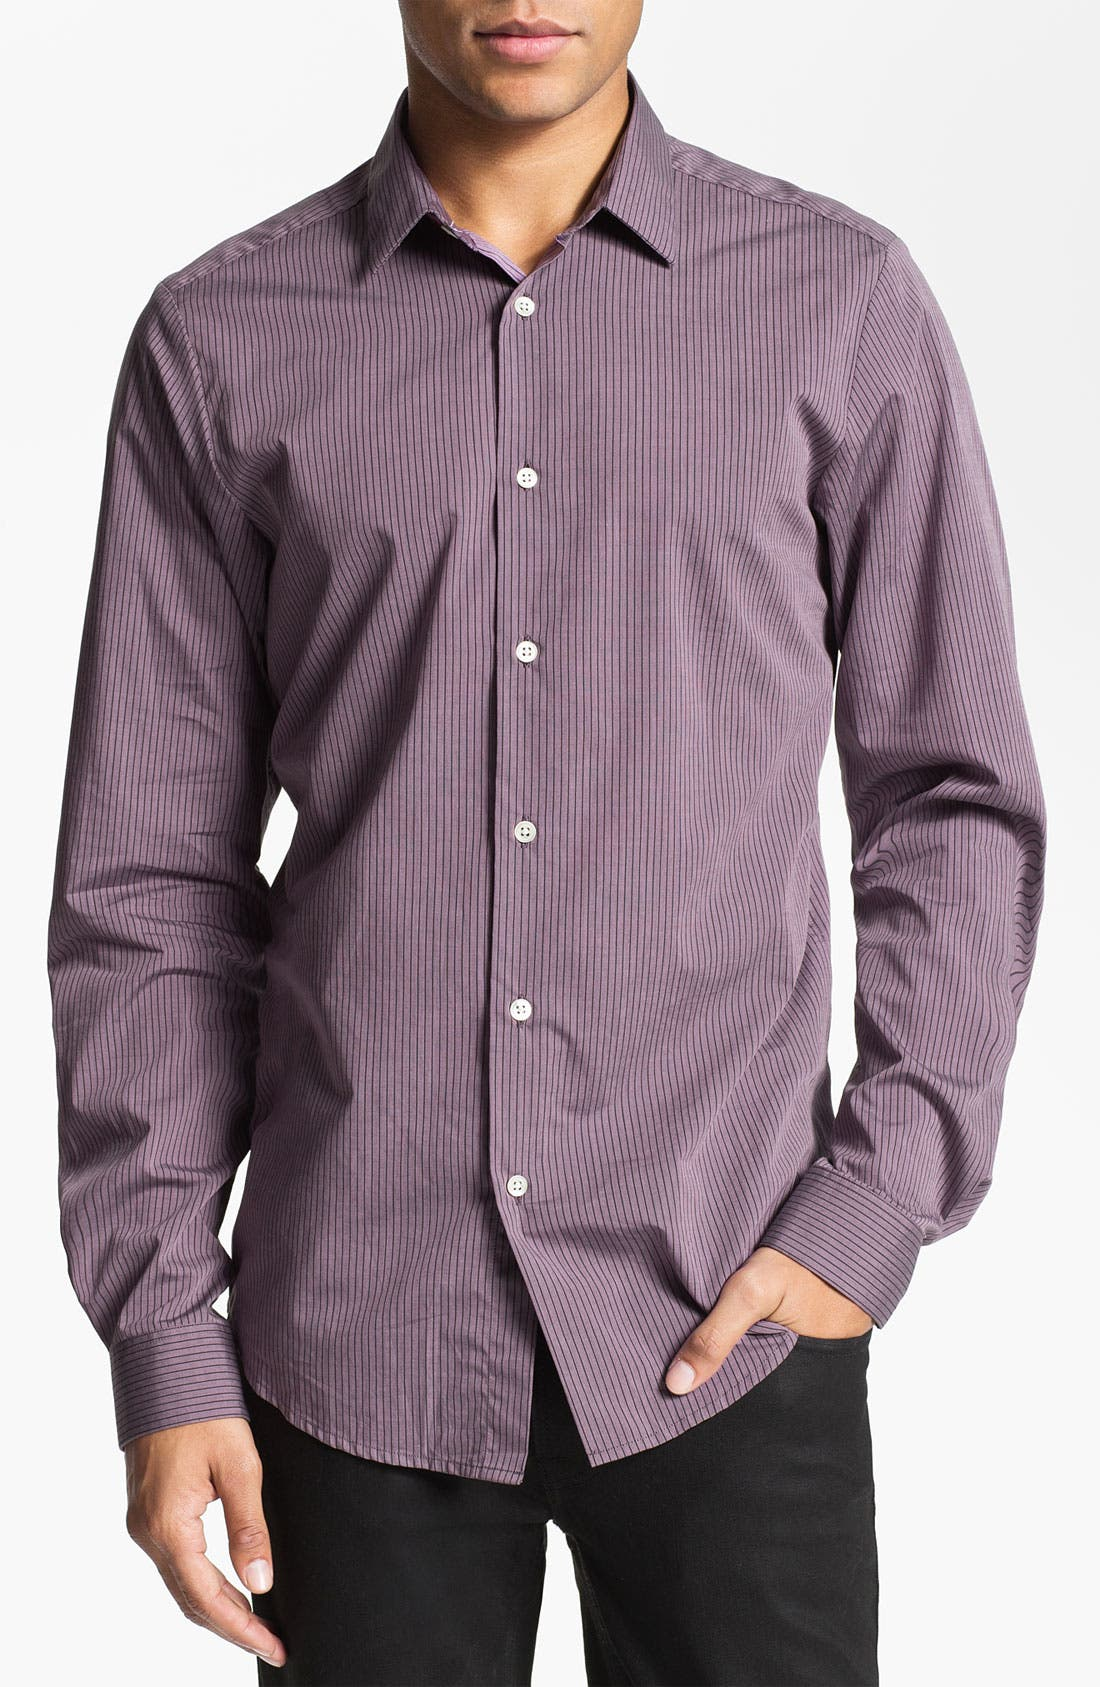 Alternate Image 1 Selected - PLECTRUM by Ben Sherman 'Shoreditch' Stripe Woven Shirt